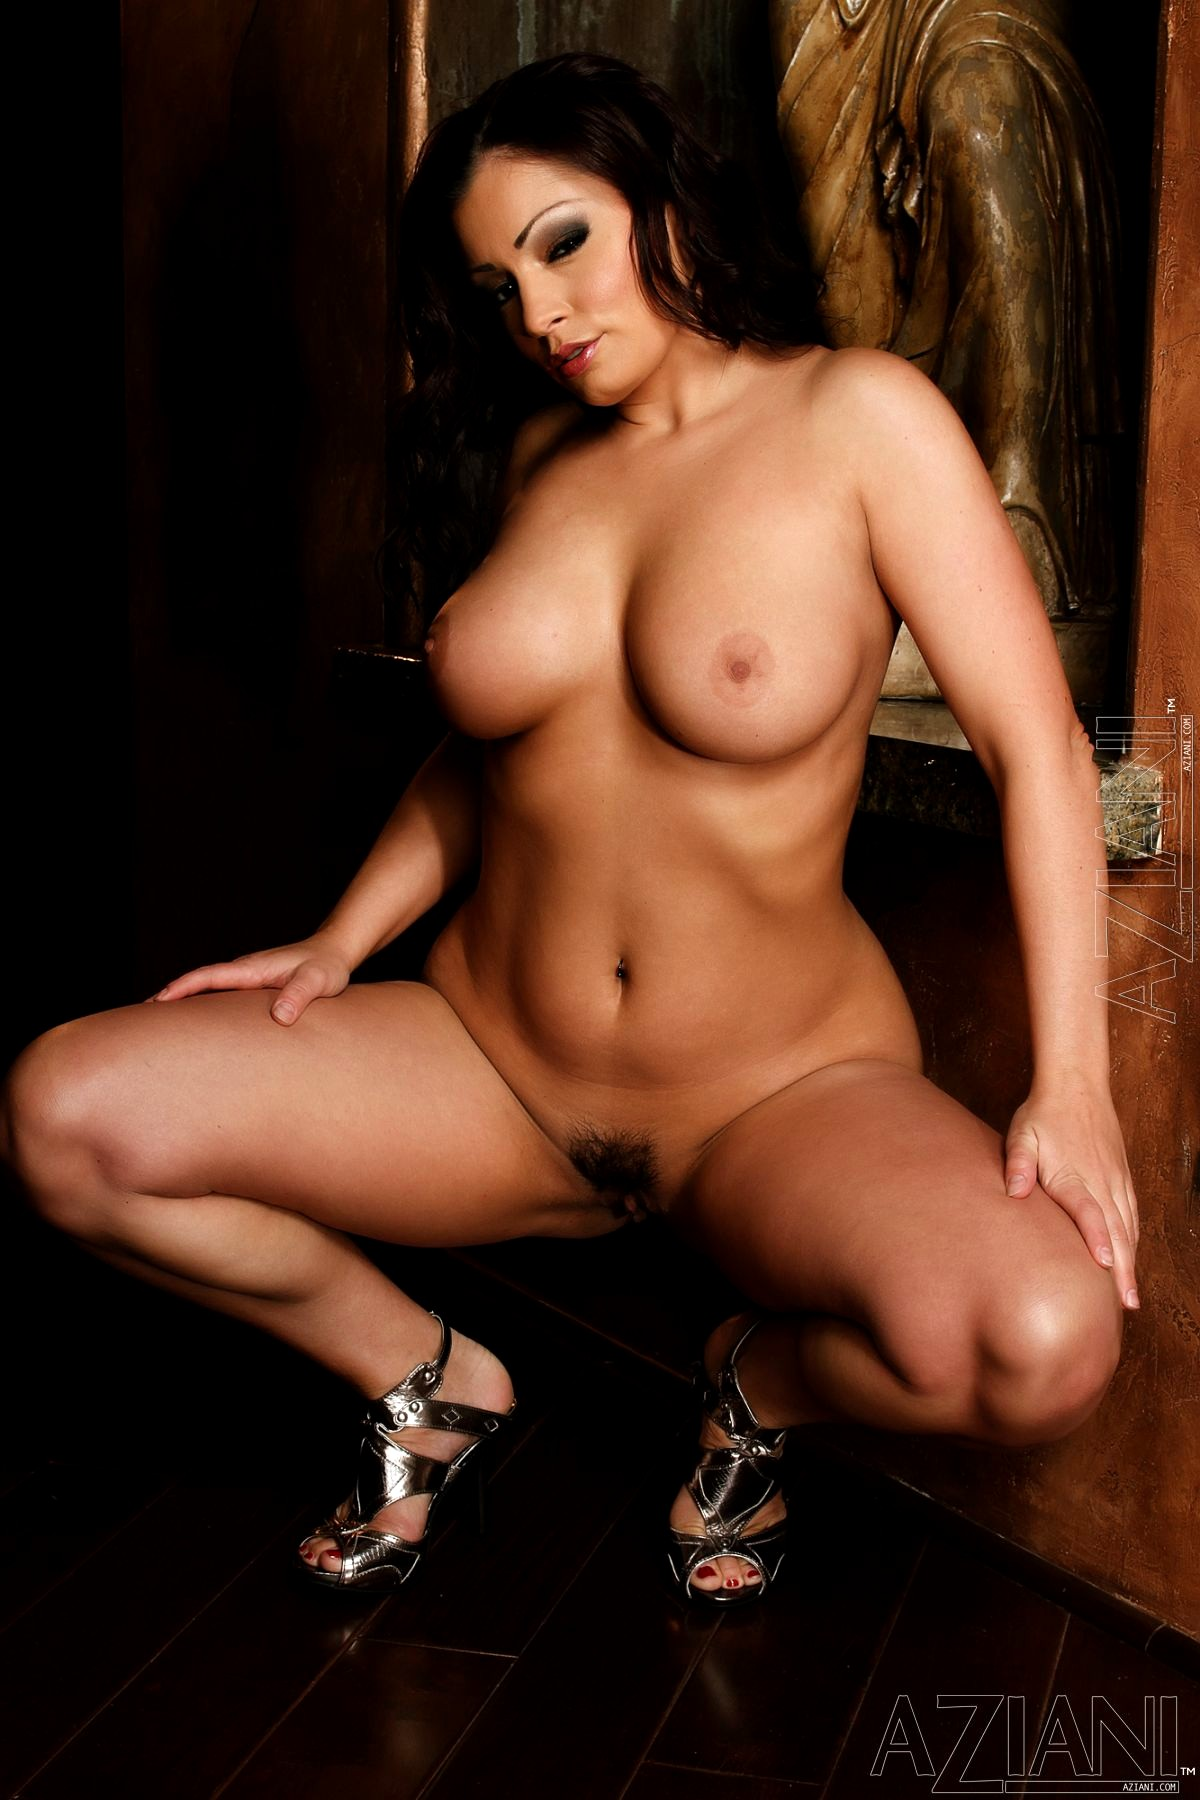 Порно ролики арии джованни, пизды раком клубничка фото